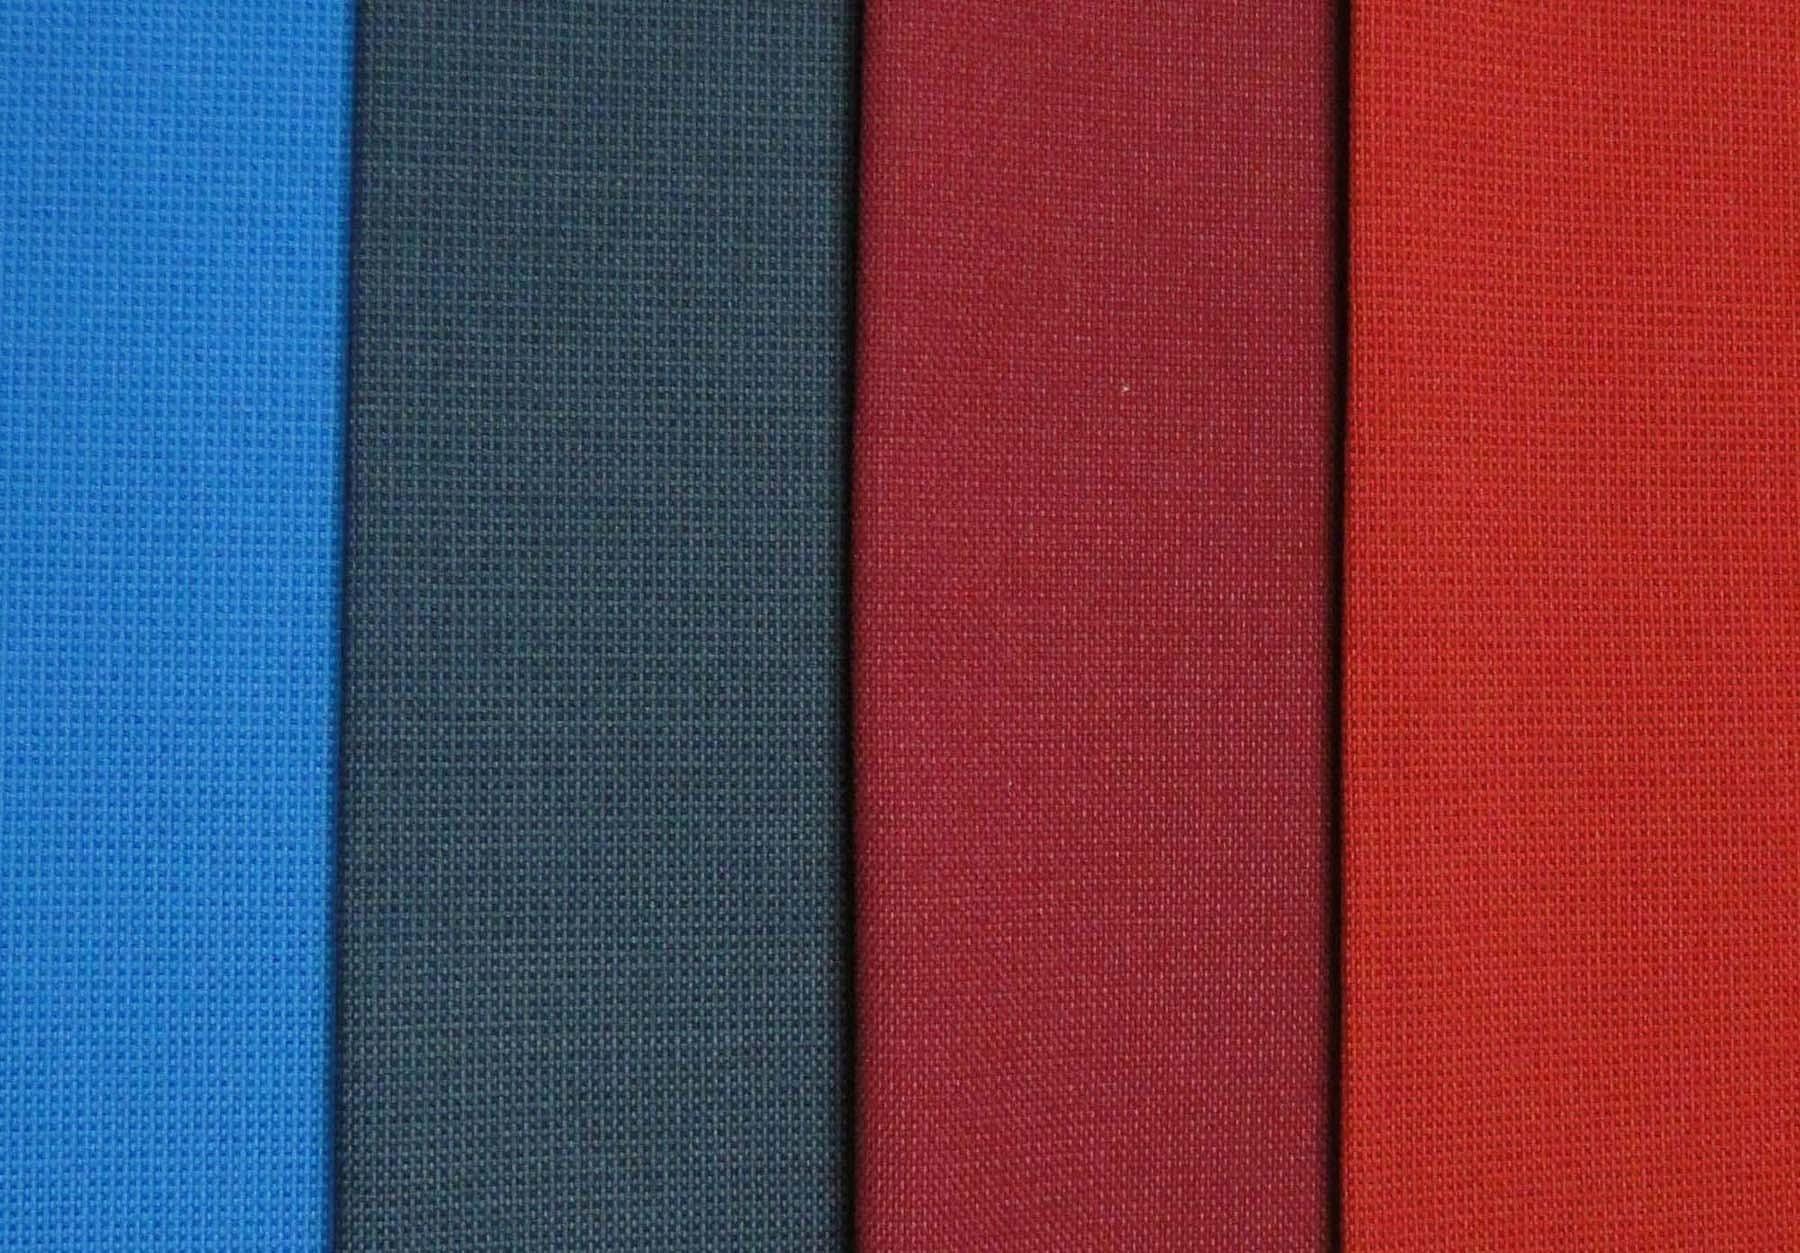 china polyester fabric china 100 polyester fabric flame retardant fabric. Black Bedroom Furniture Sets. Home Design Ideas